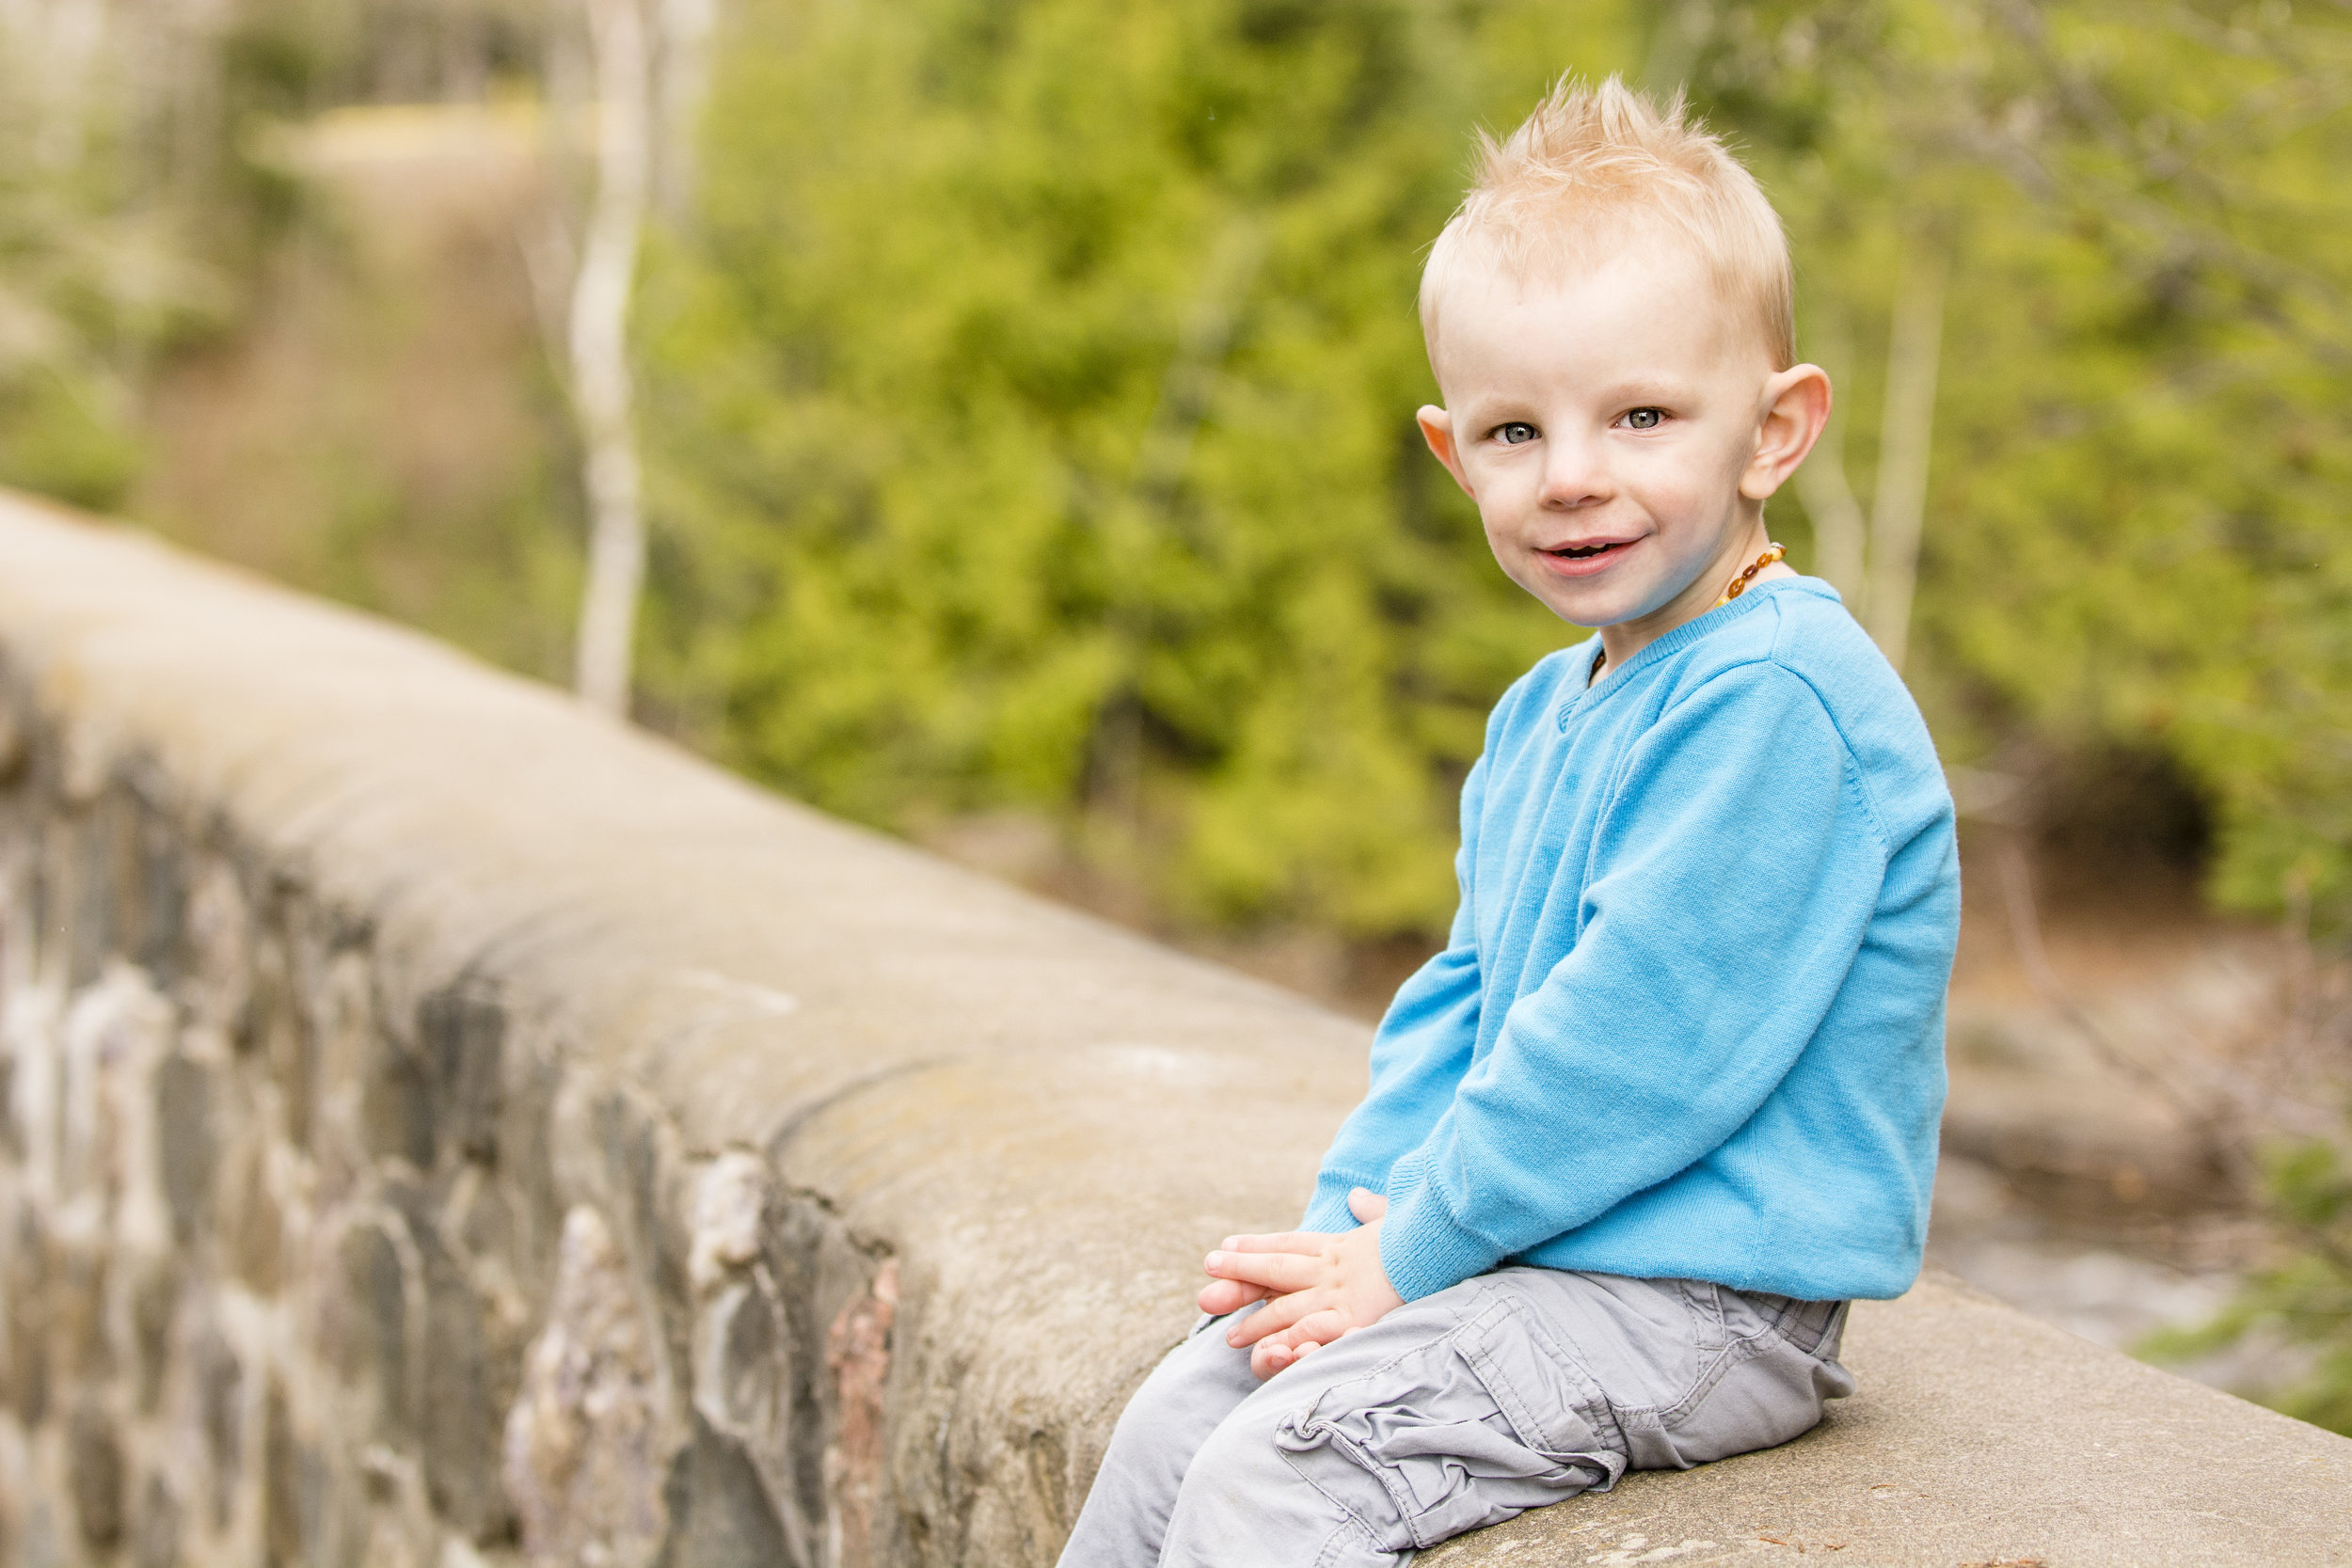 Photo of a boy on a wall taken at Centennial Park in Thunder Bay.